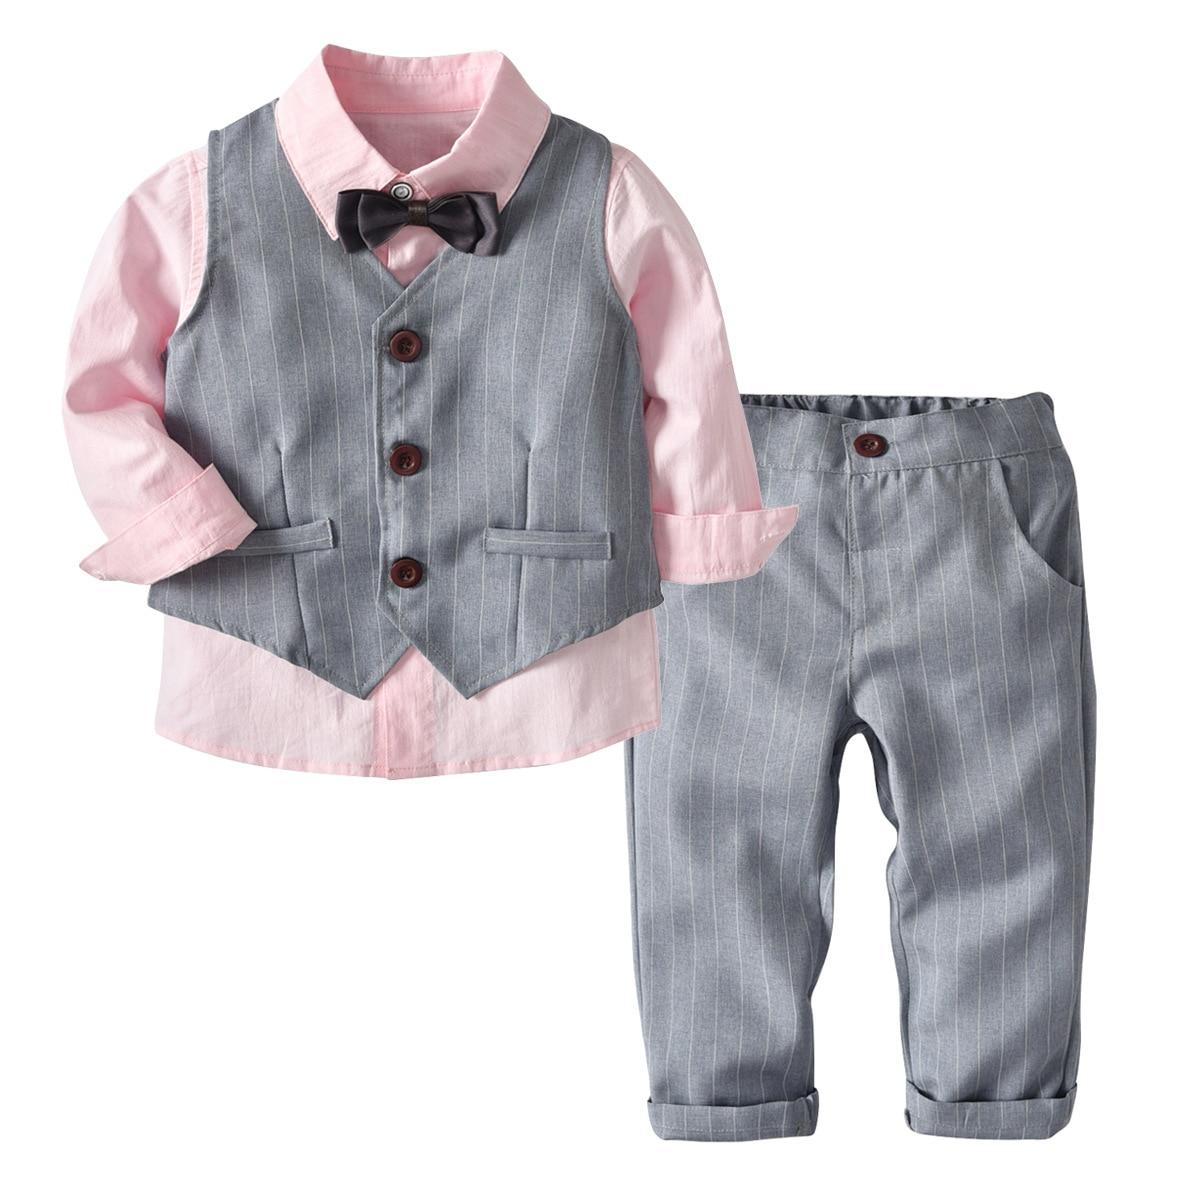 Boys' long sleeved shirt waistcoat trousers Gentleman bow tie Gentleman suit Pao Qiu four-piece set dedo mg 381 british gentleman bow tie black